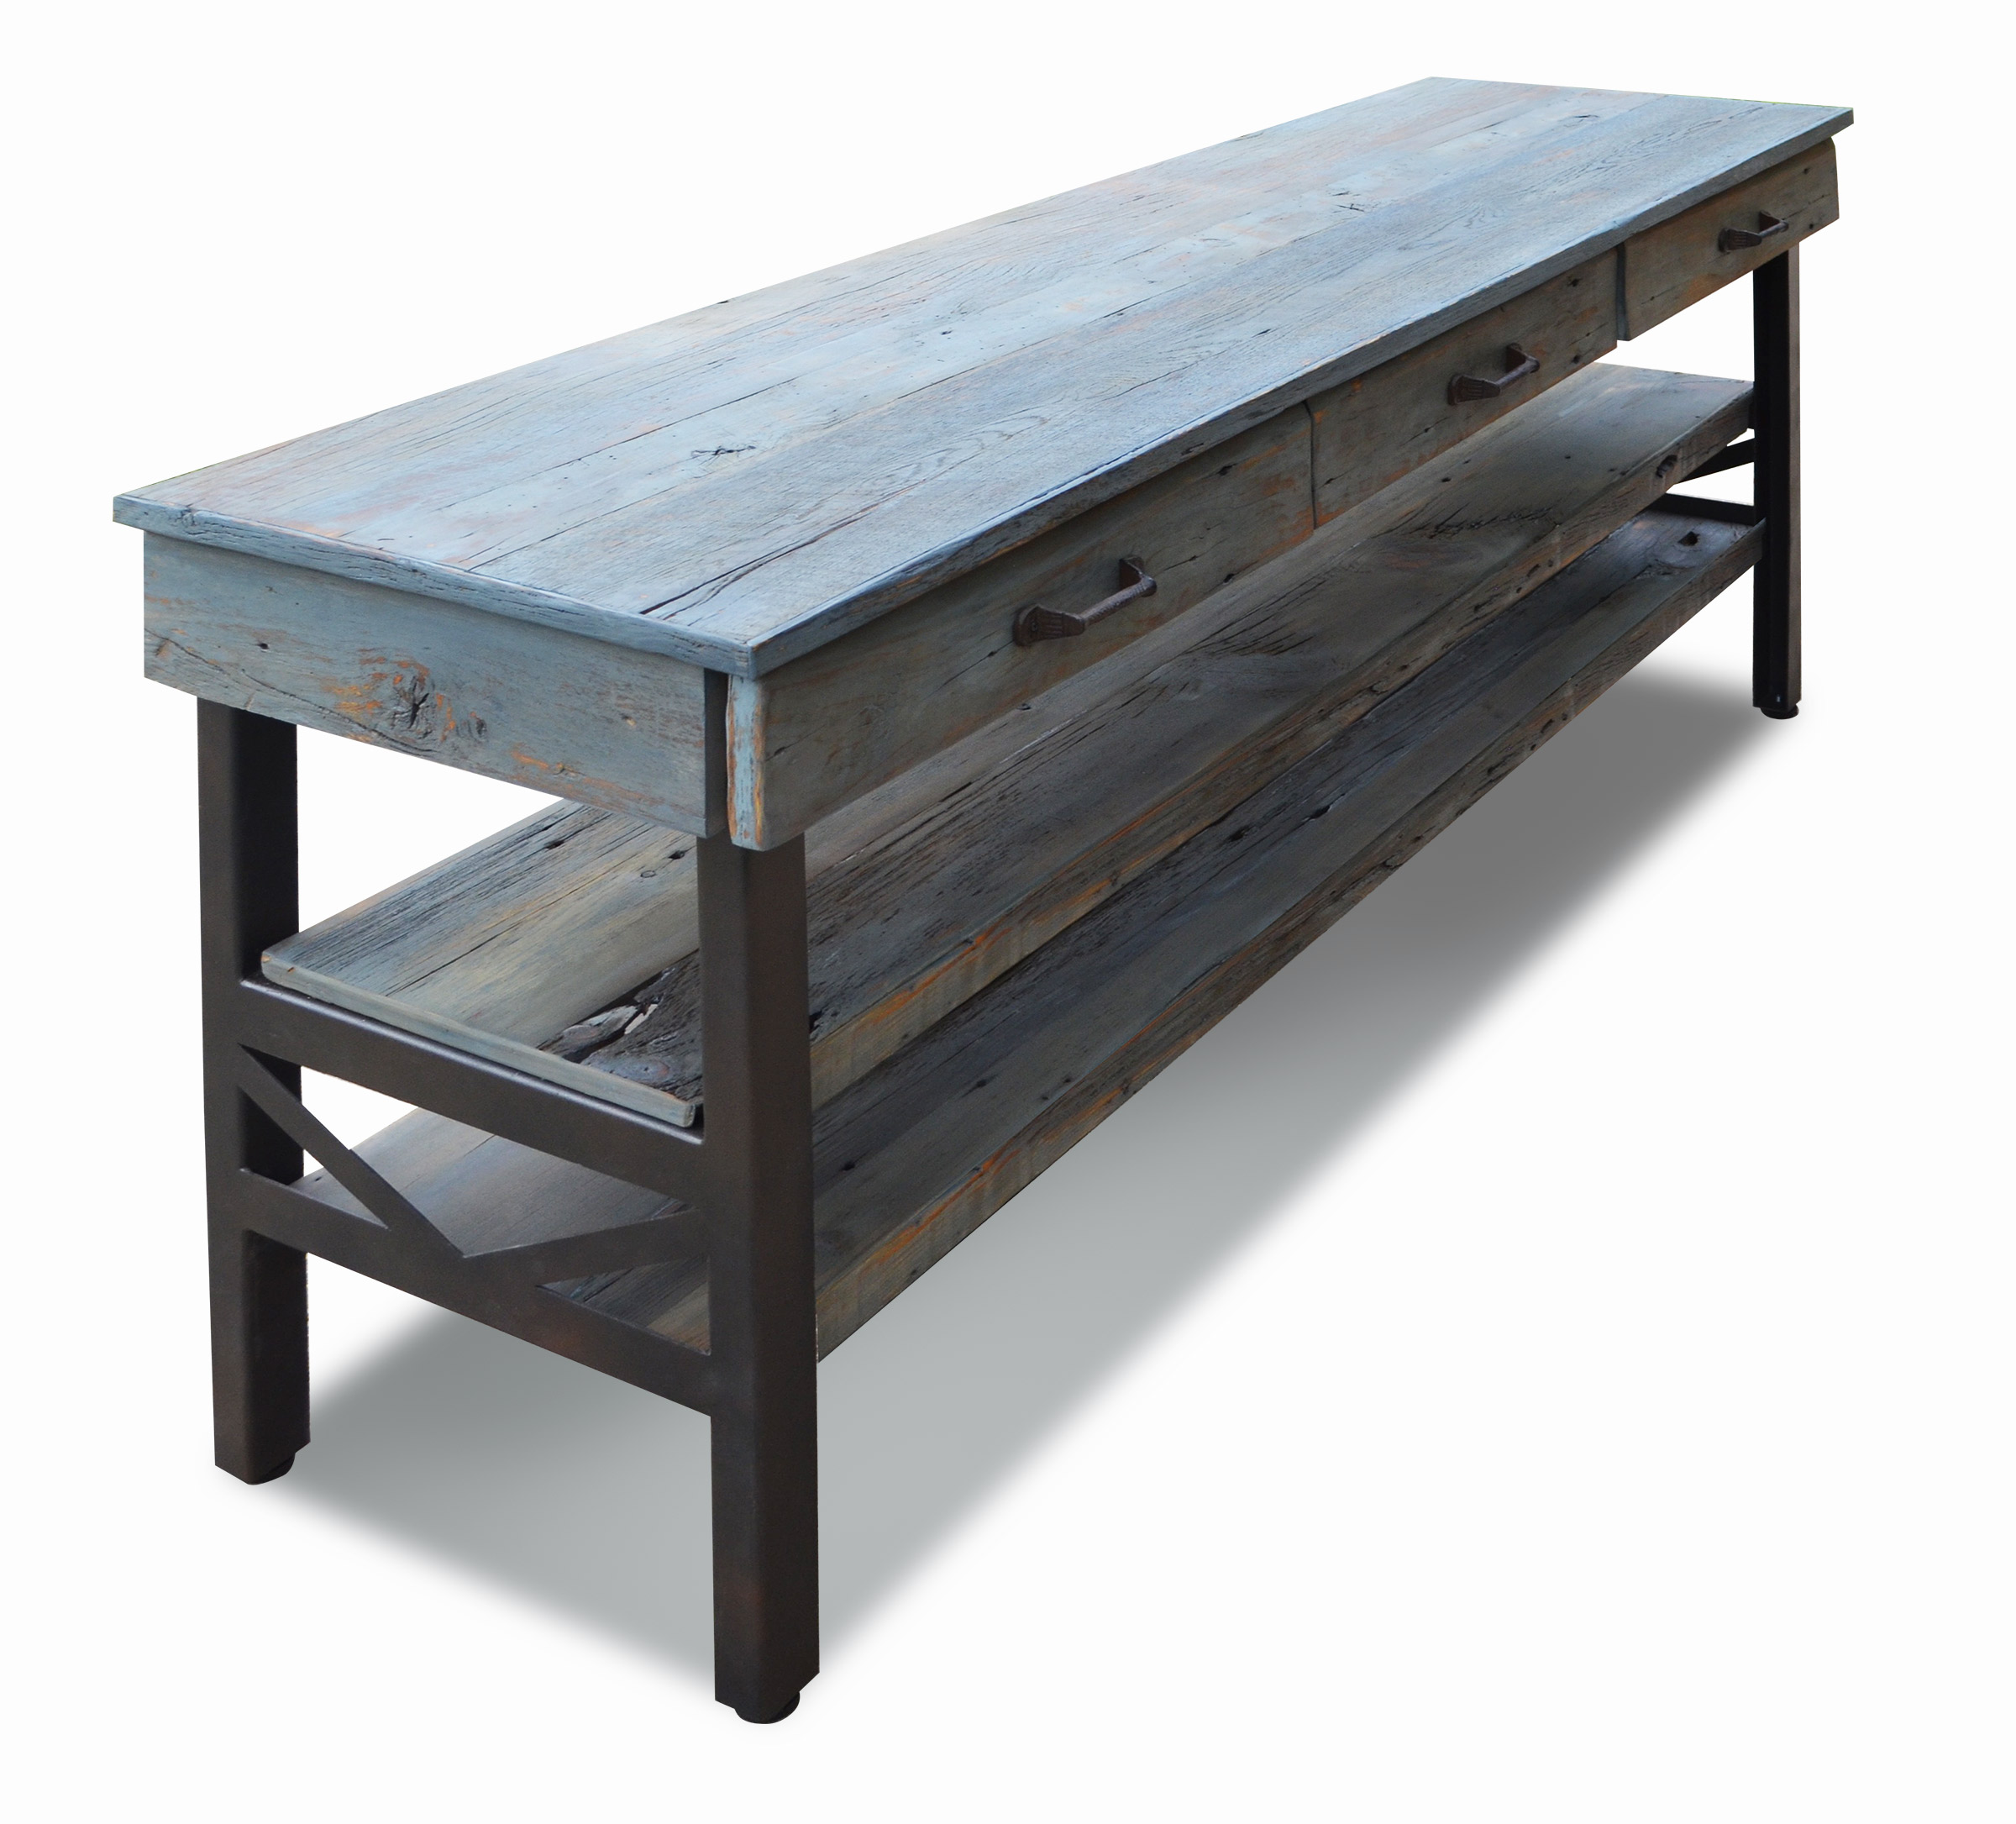 456a656b6970 Rustic oak industrial dining console